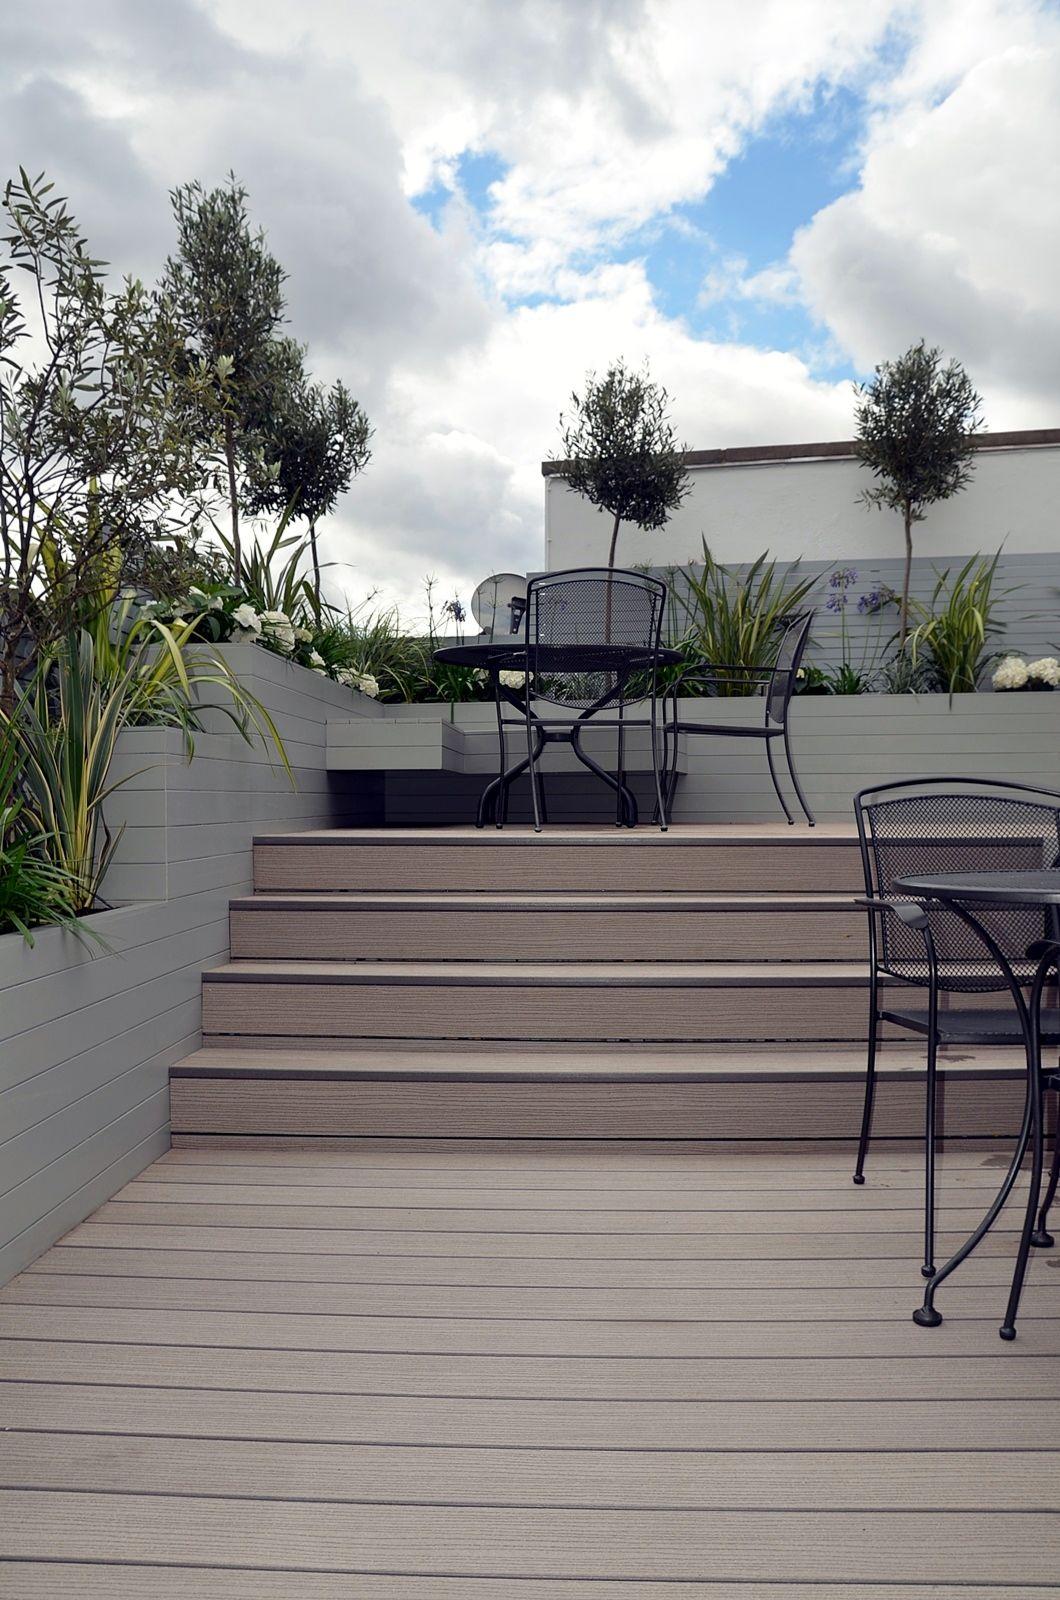 Penthouse Roof Terrace Garden Design Tower Bridge Docklands London Modern Garden Design Terrace Garden Design London Garden